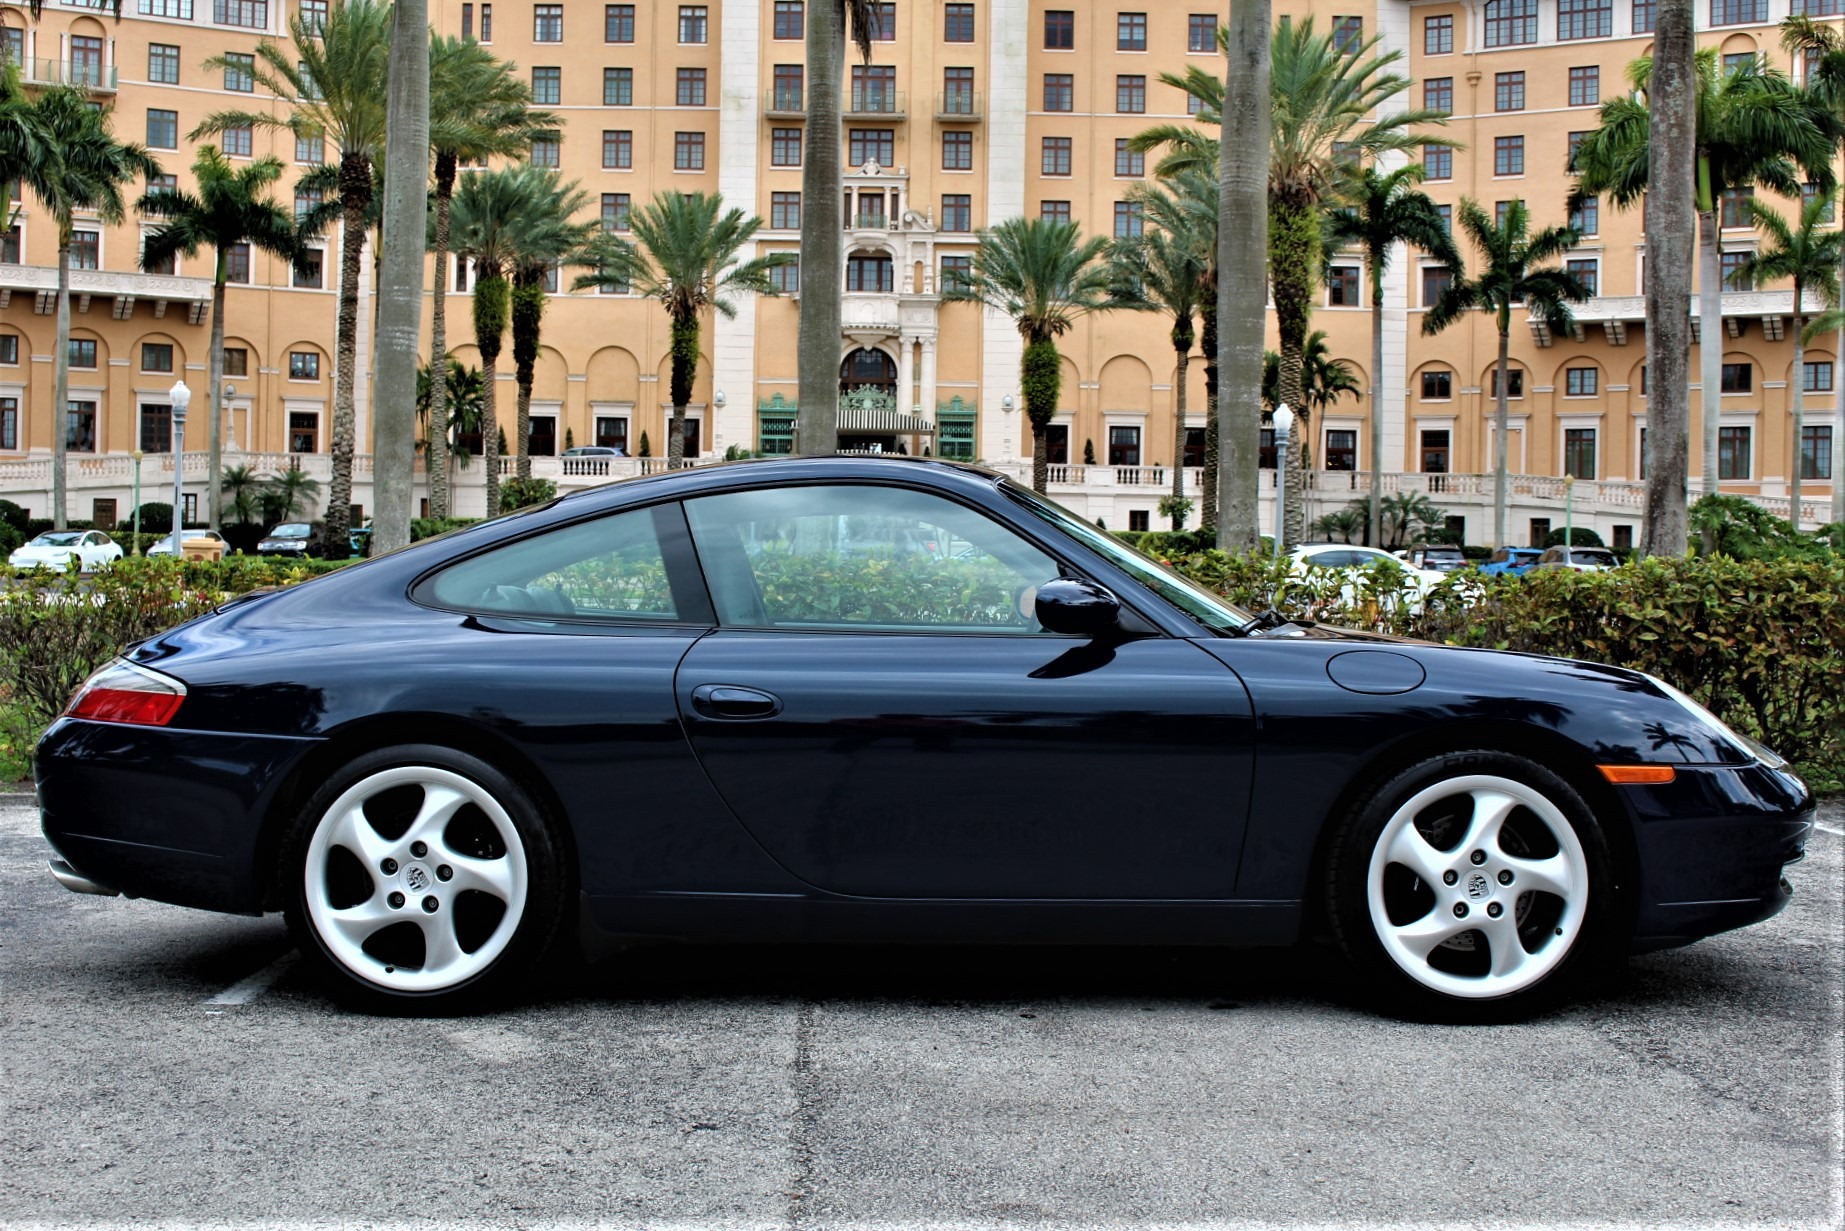 Used 2000 Porsche 911 Carrera for sale $39,850 at The Gables Sports Cars in Miami FL 33146 1